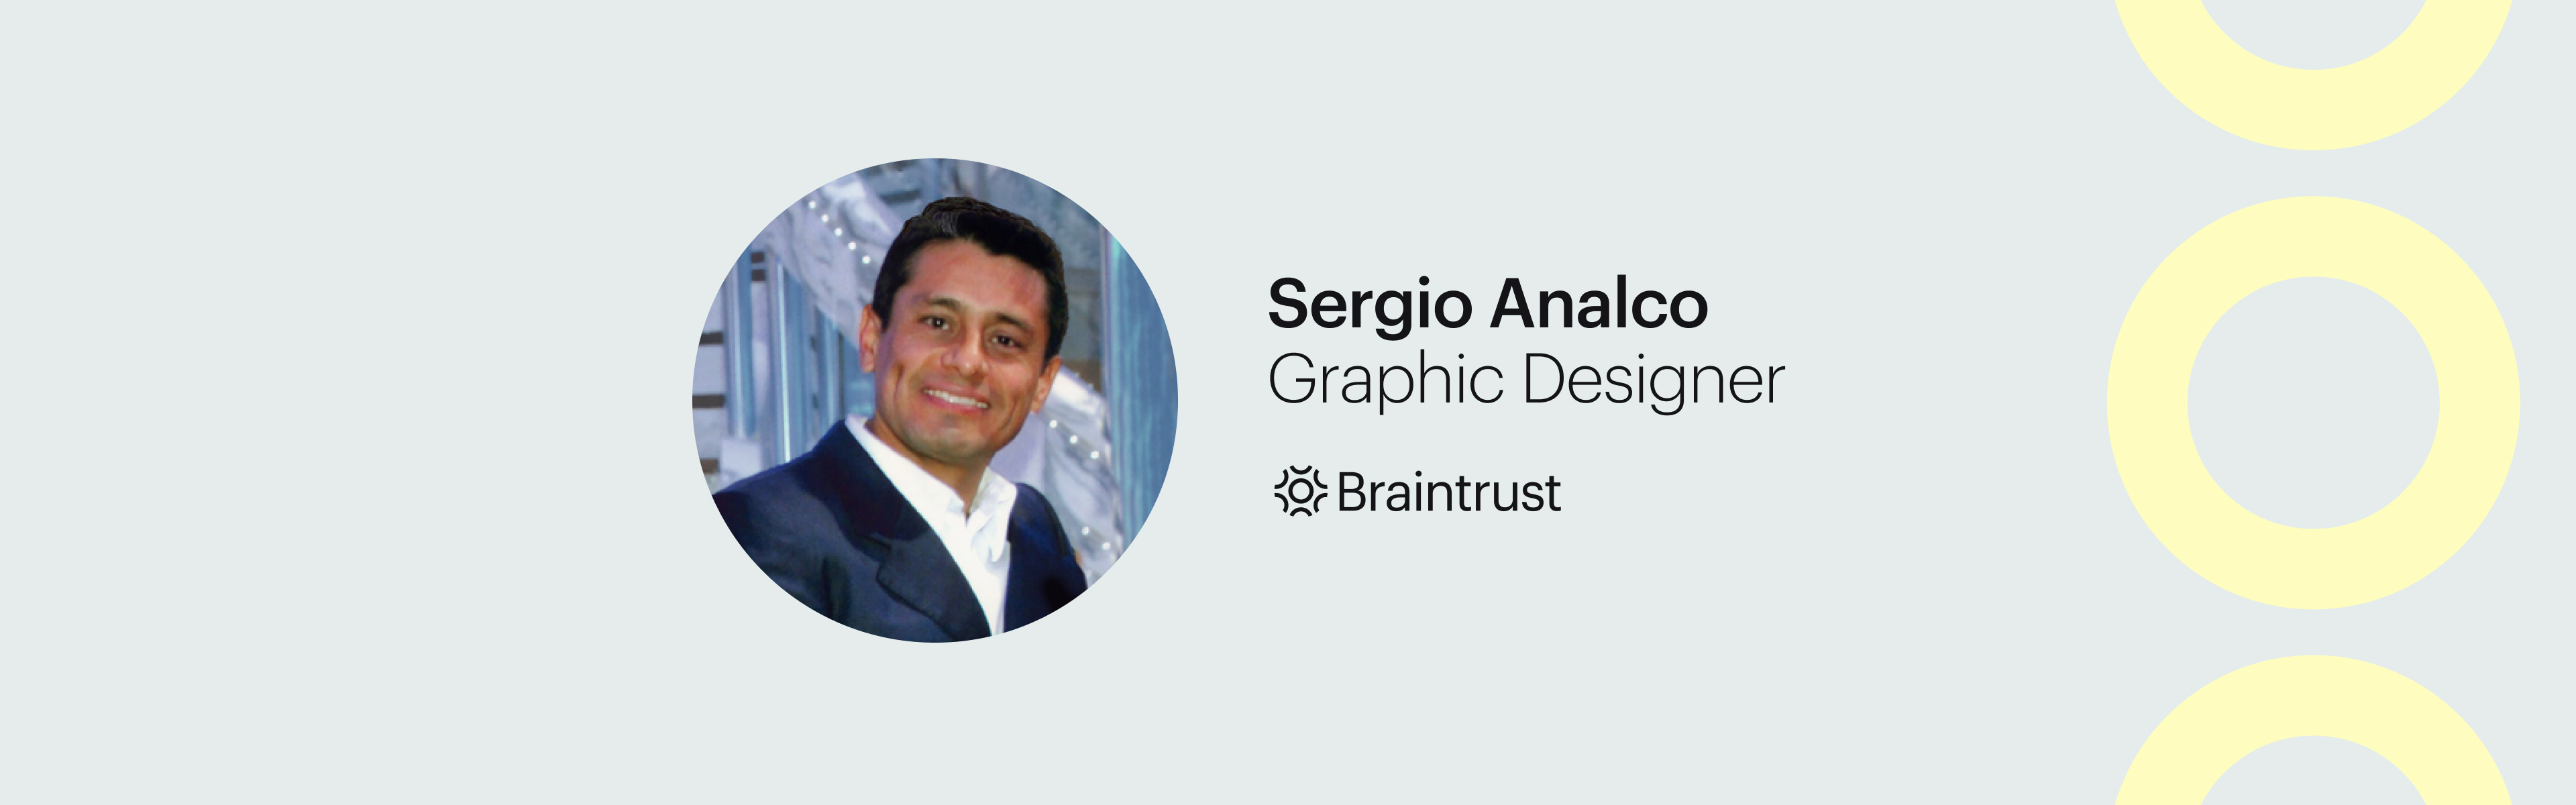 Talent Spotlight_ How Sergio Analco Helped a Feature Film Win 29 International Awards. Braintrust Blog Banner